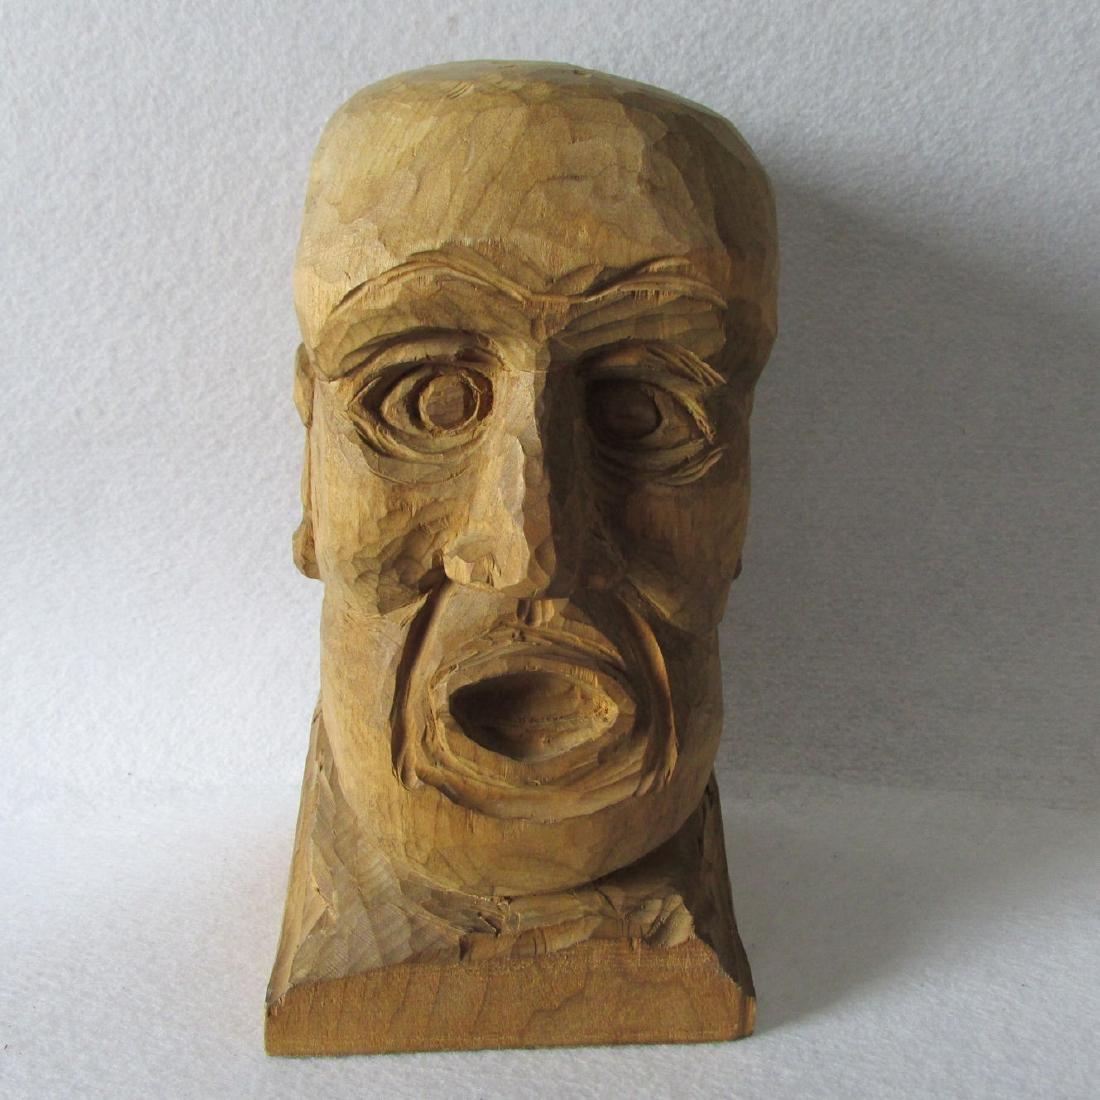 Folk Art Hand Carved Bust of a Man